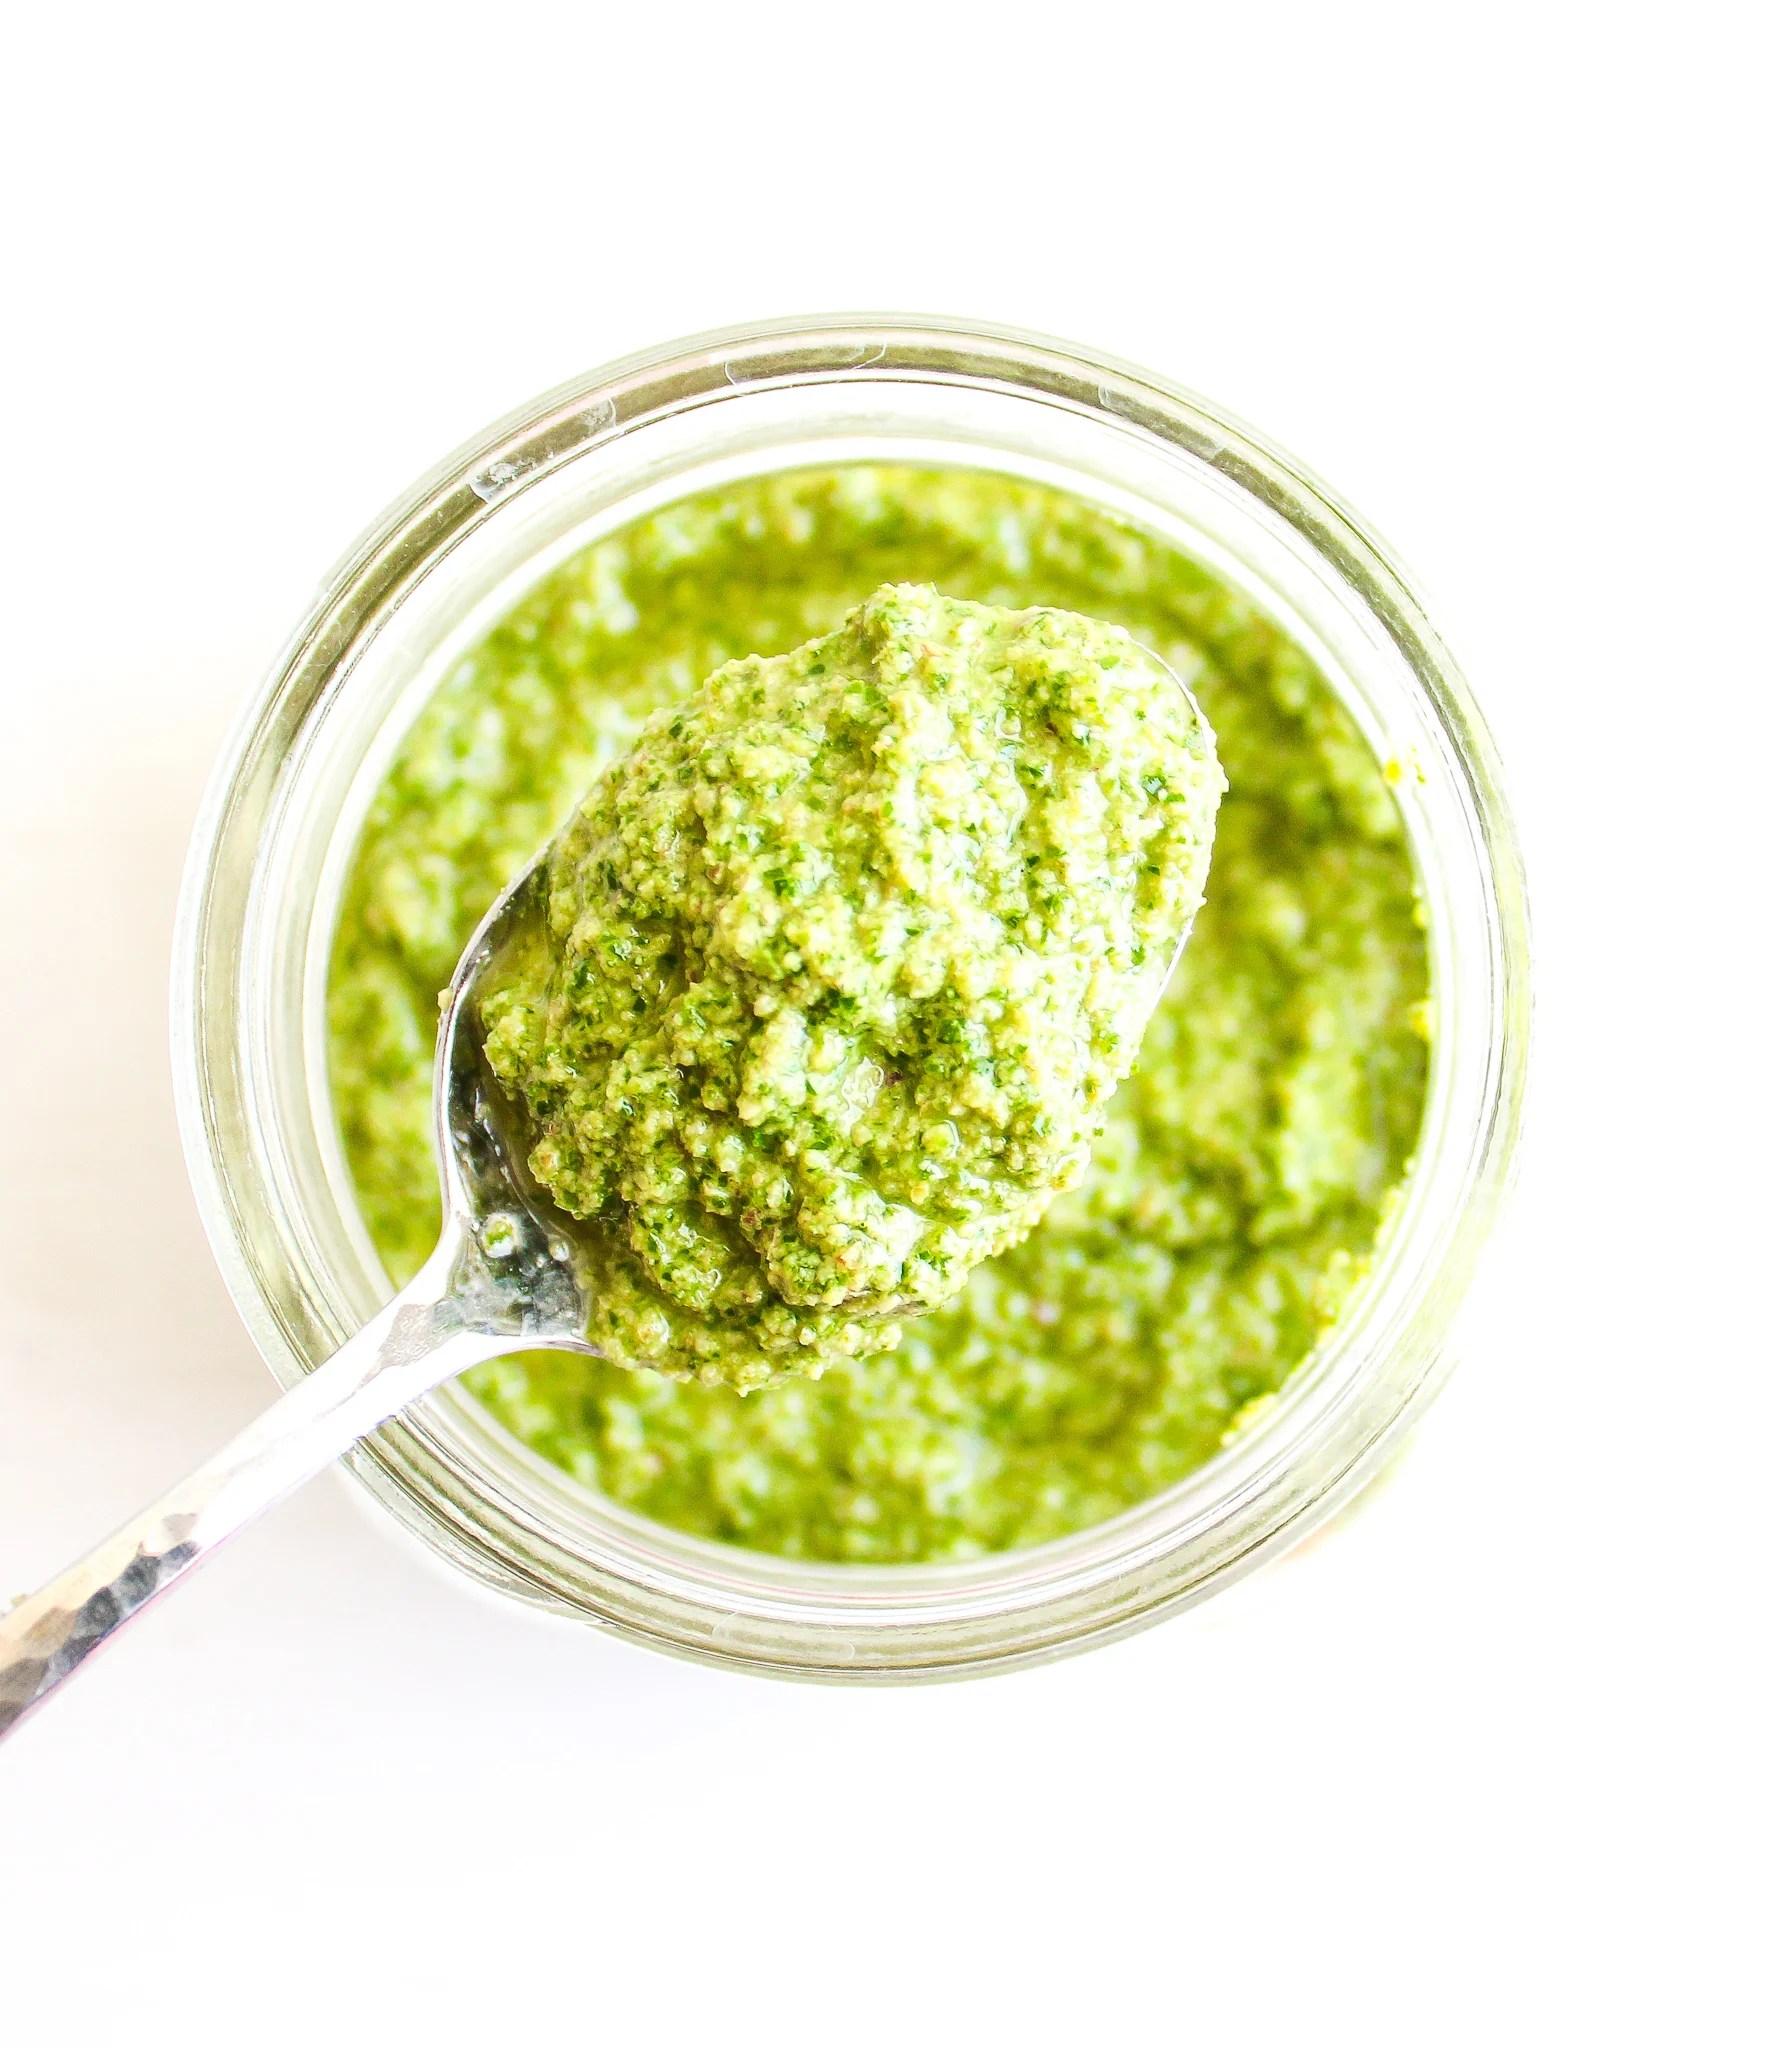 Spinach, Arugula & Walnut Pesto